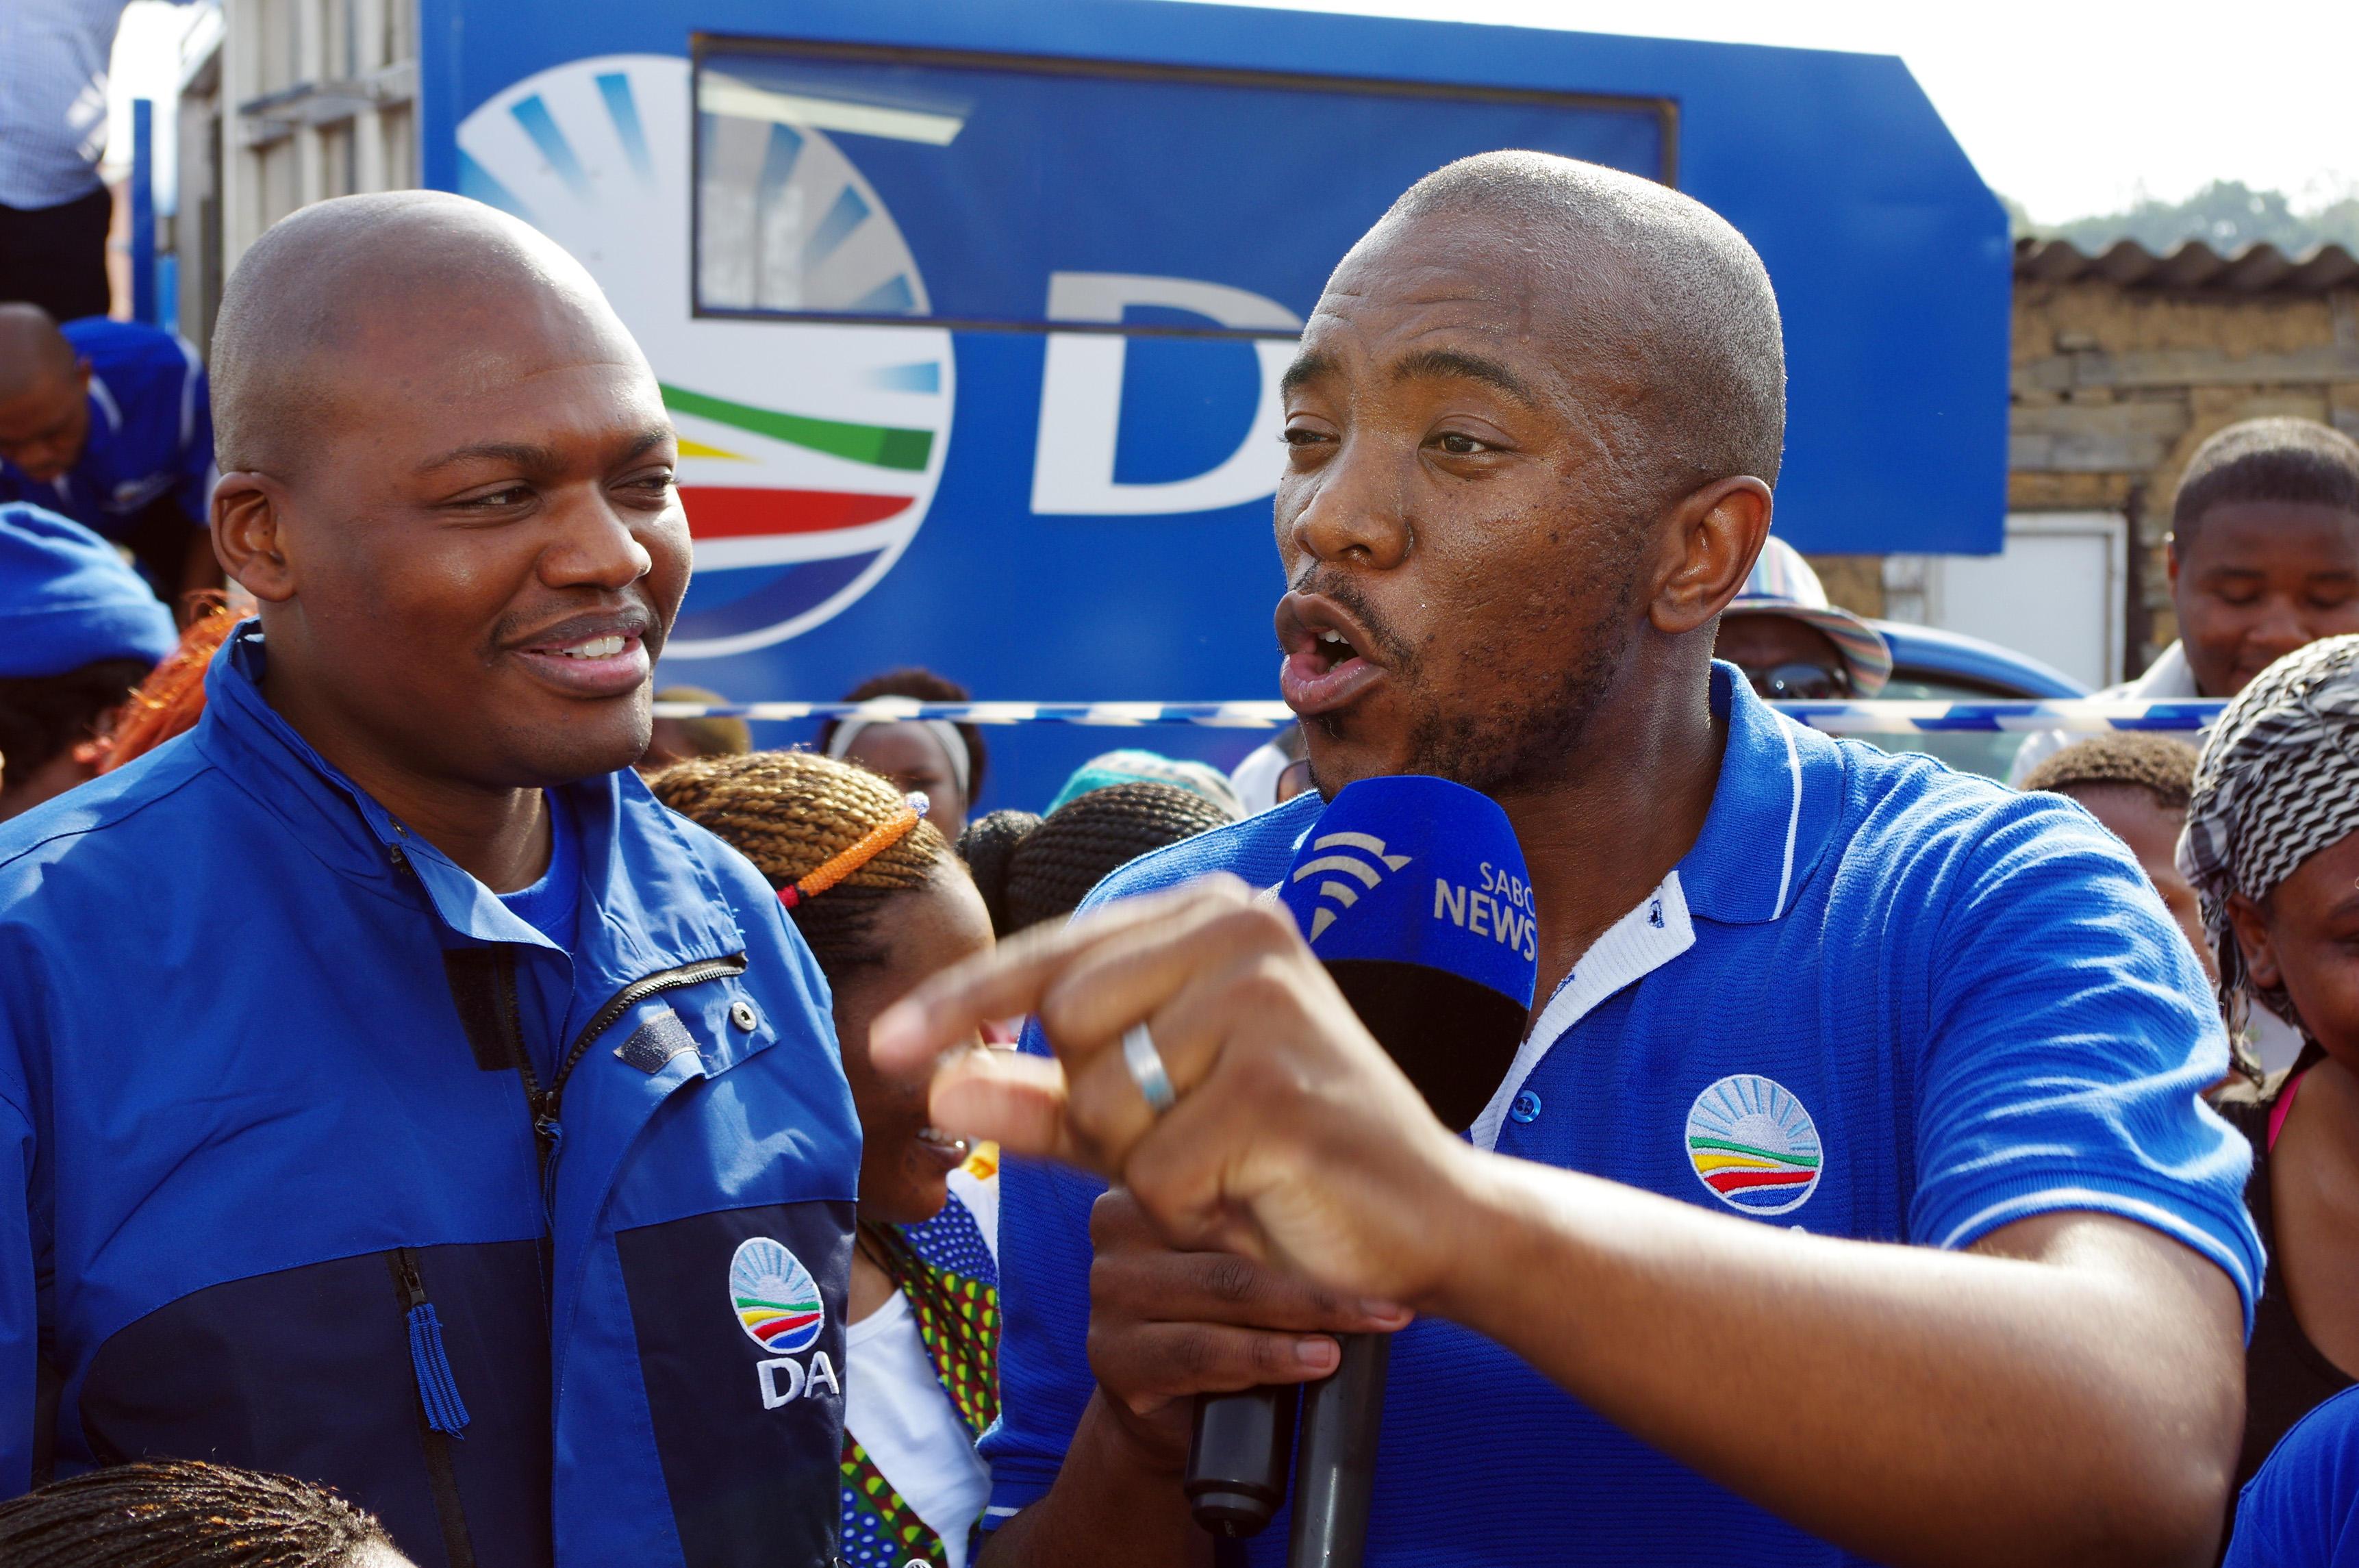 Un nero guida i bianchi: è l'Obama del Sudafrica